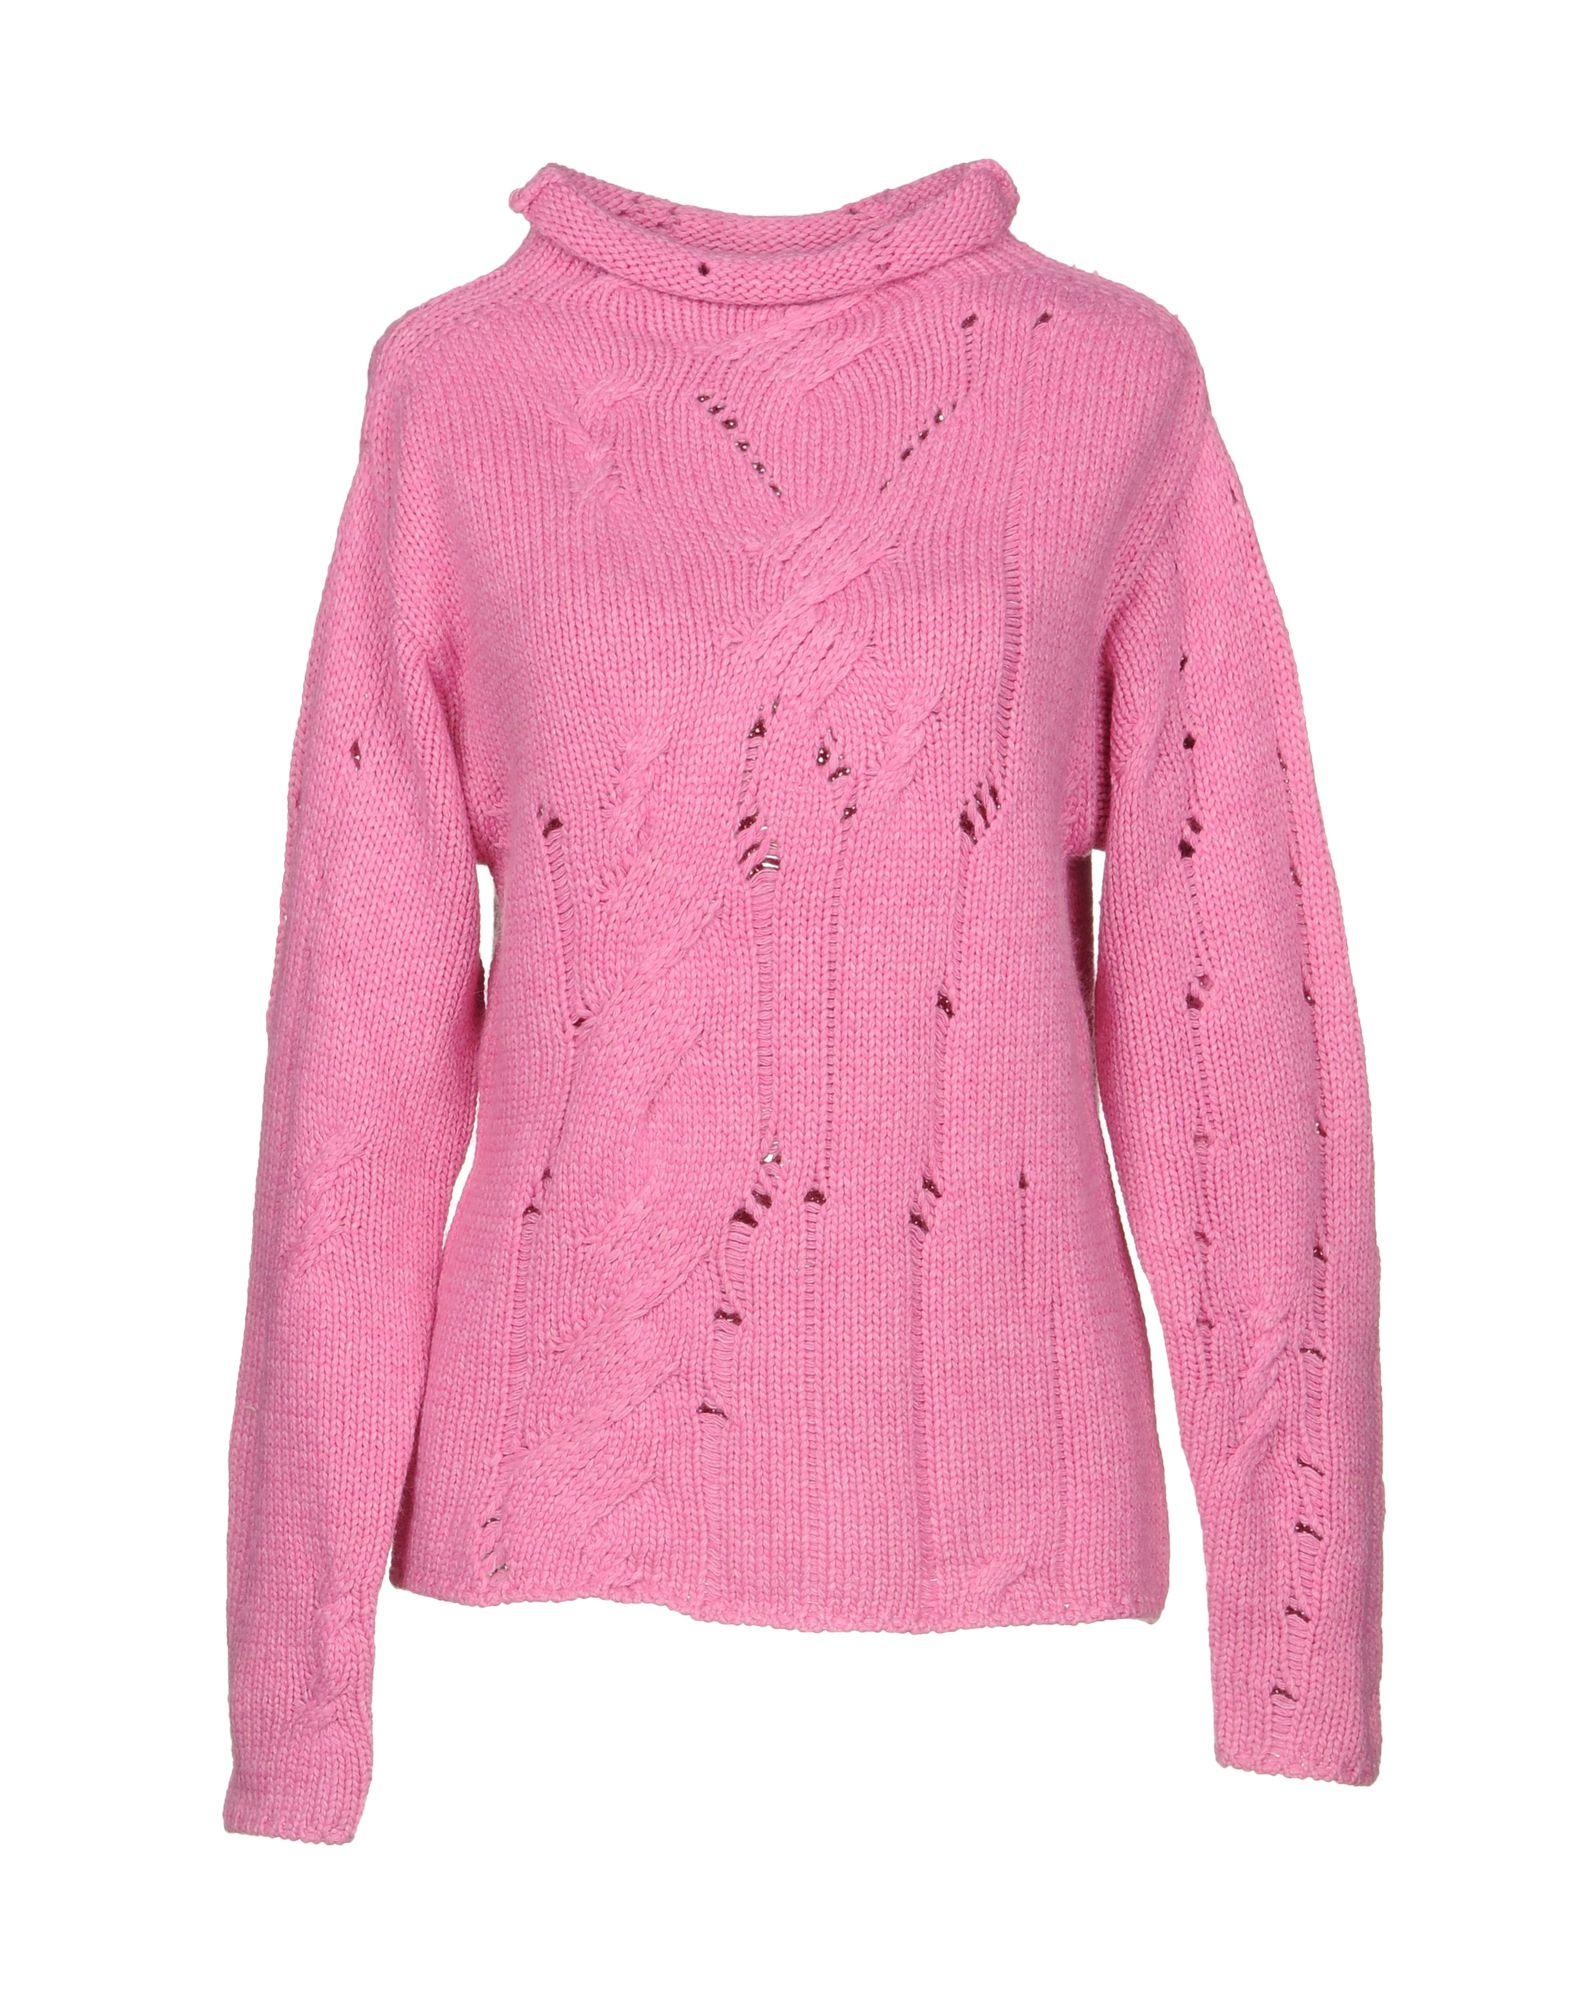 Dolcevita Cashmere Company Donna - Acquista online su 2nU7C